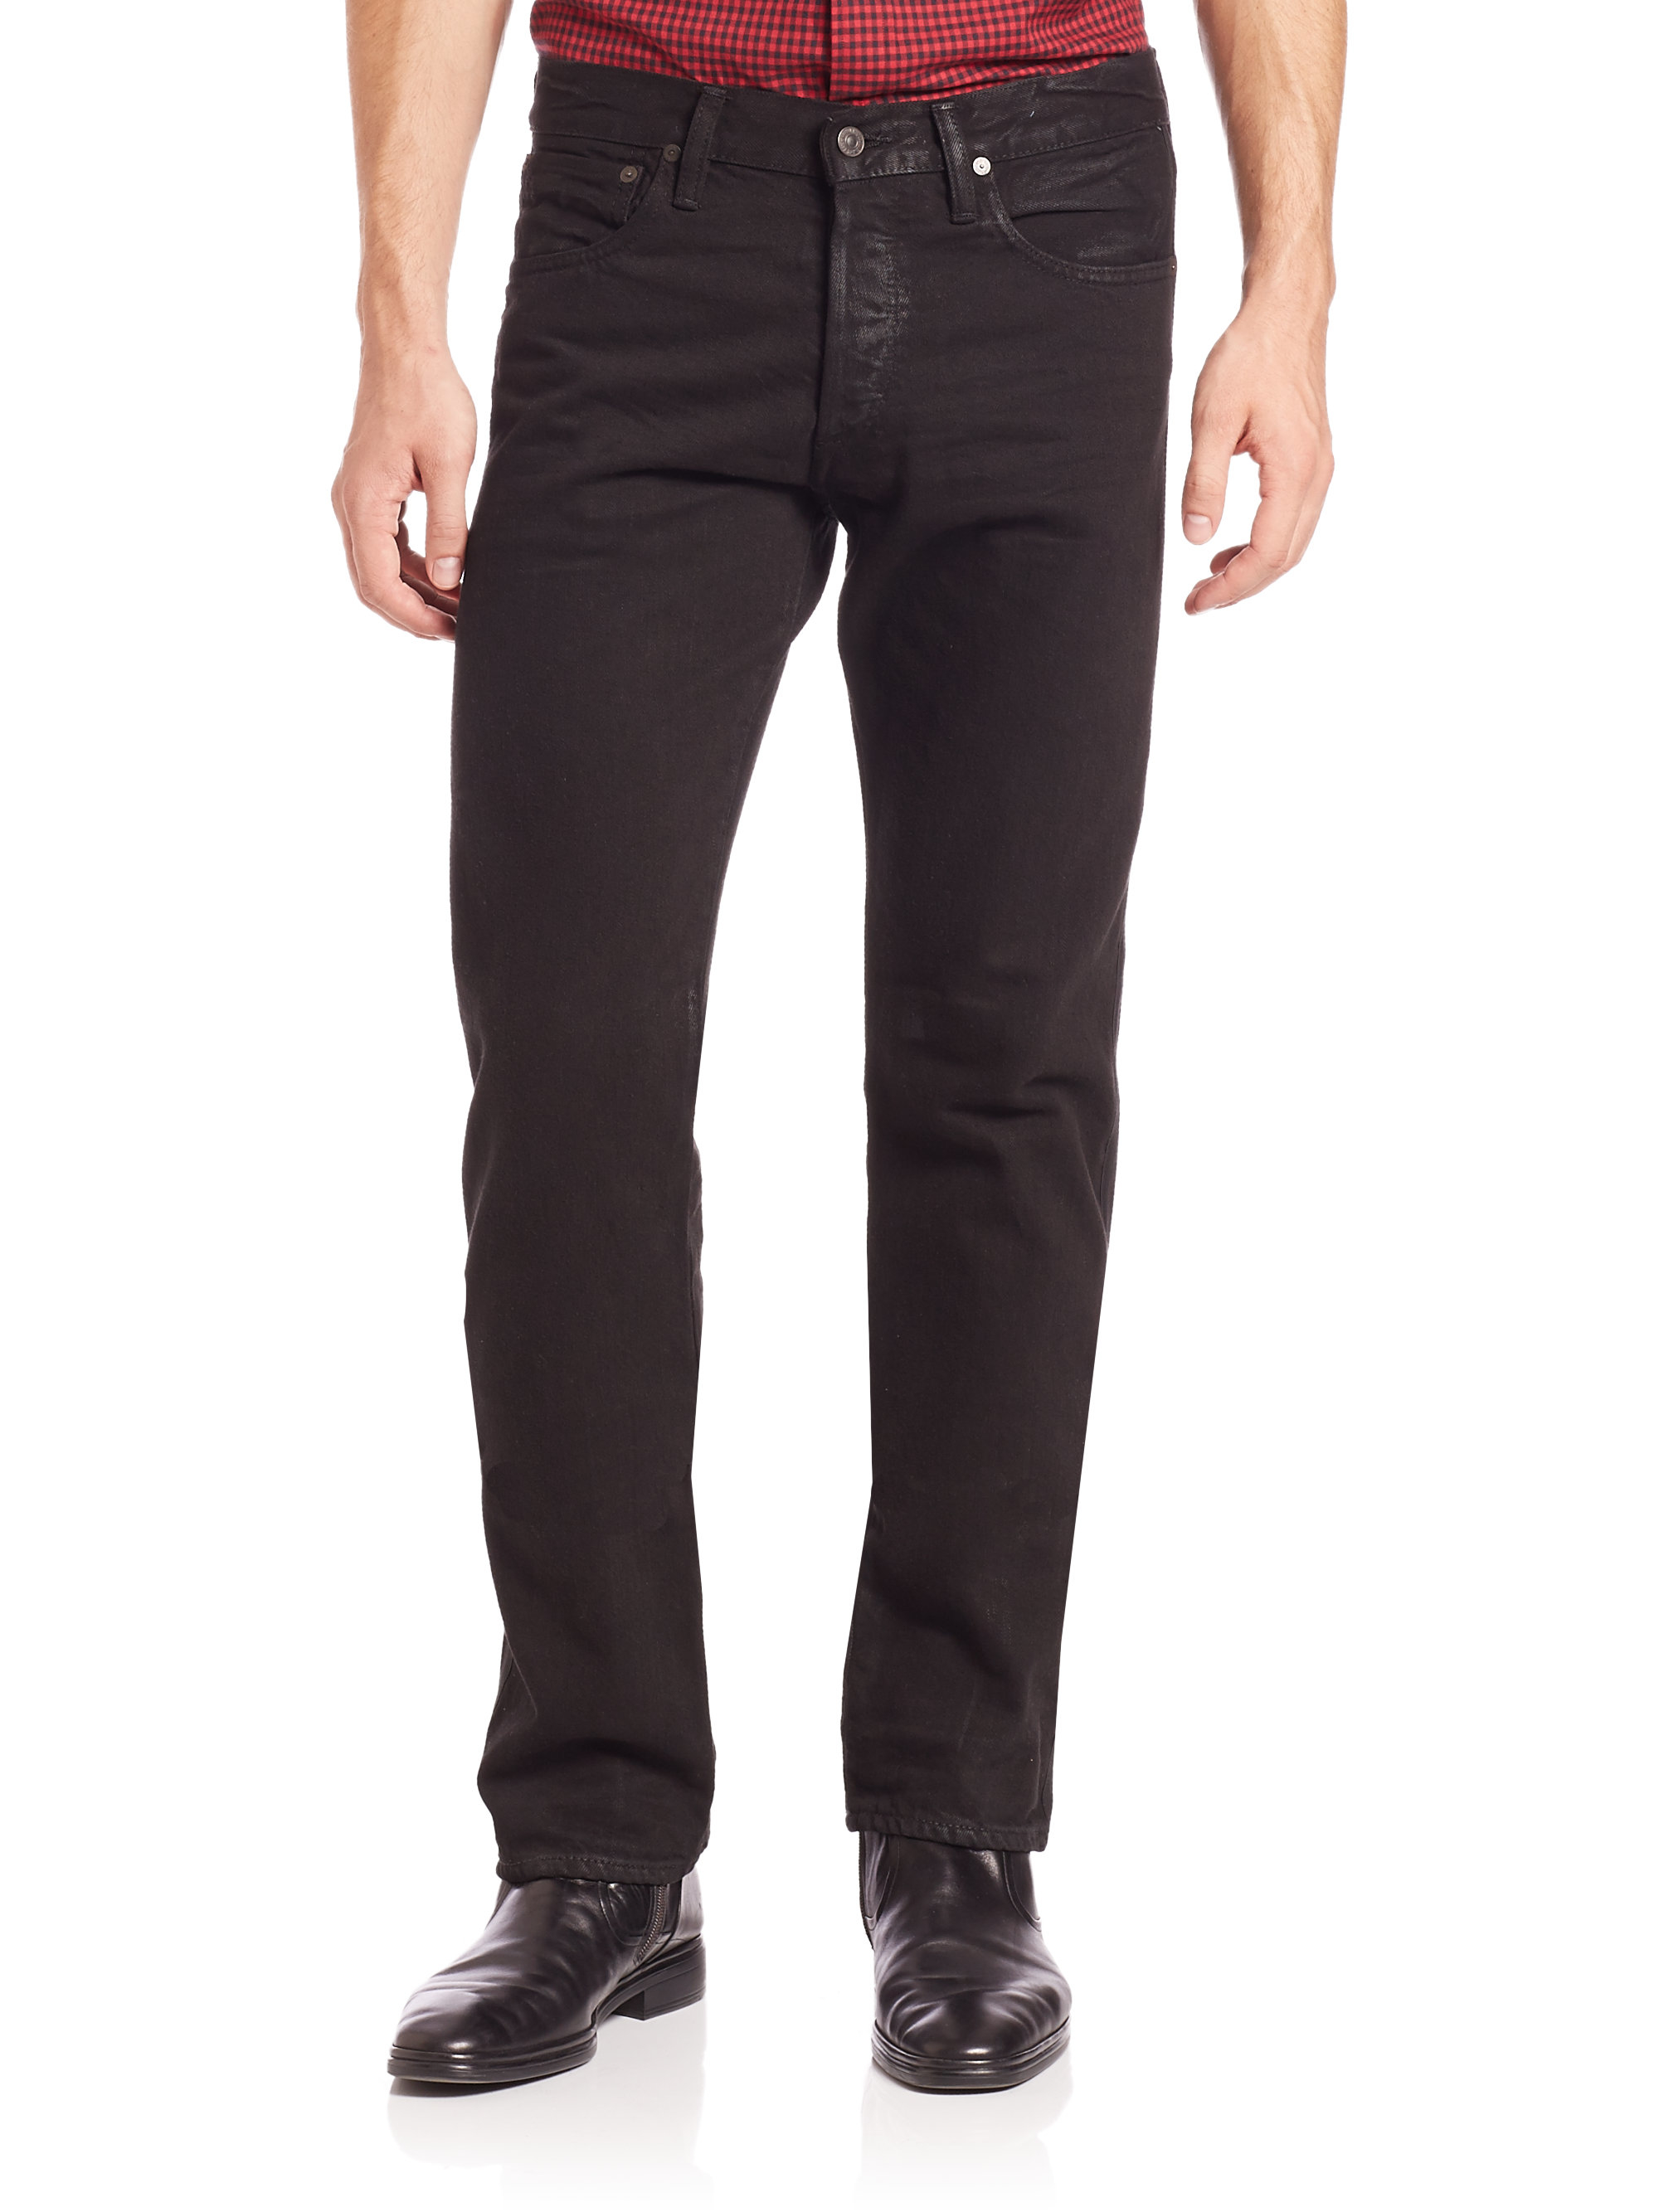 polo ralph lauren coated denim jeans in blue for men lyst. Black Bedroom Furniture Sets. Home Design Ideas